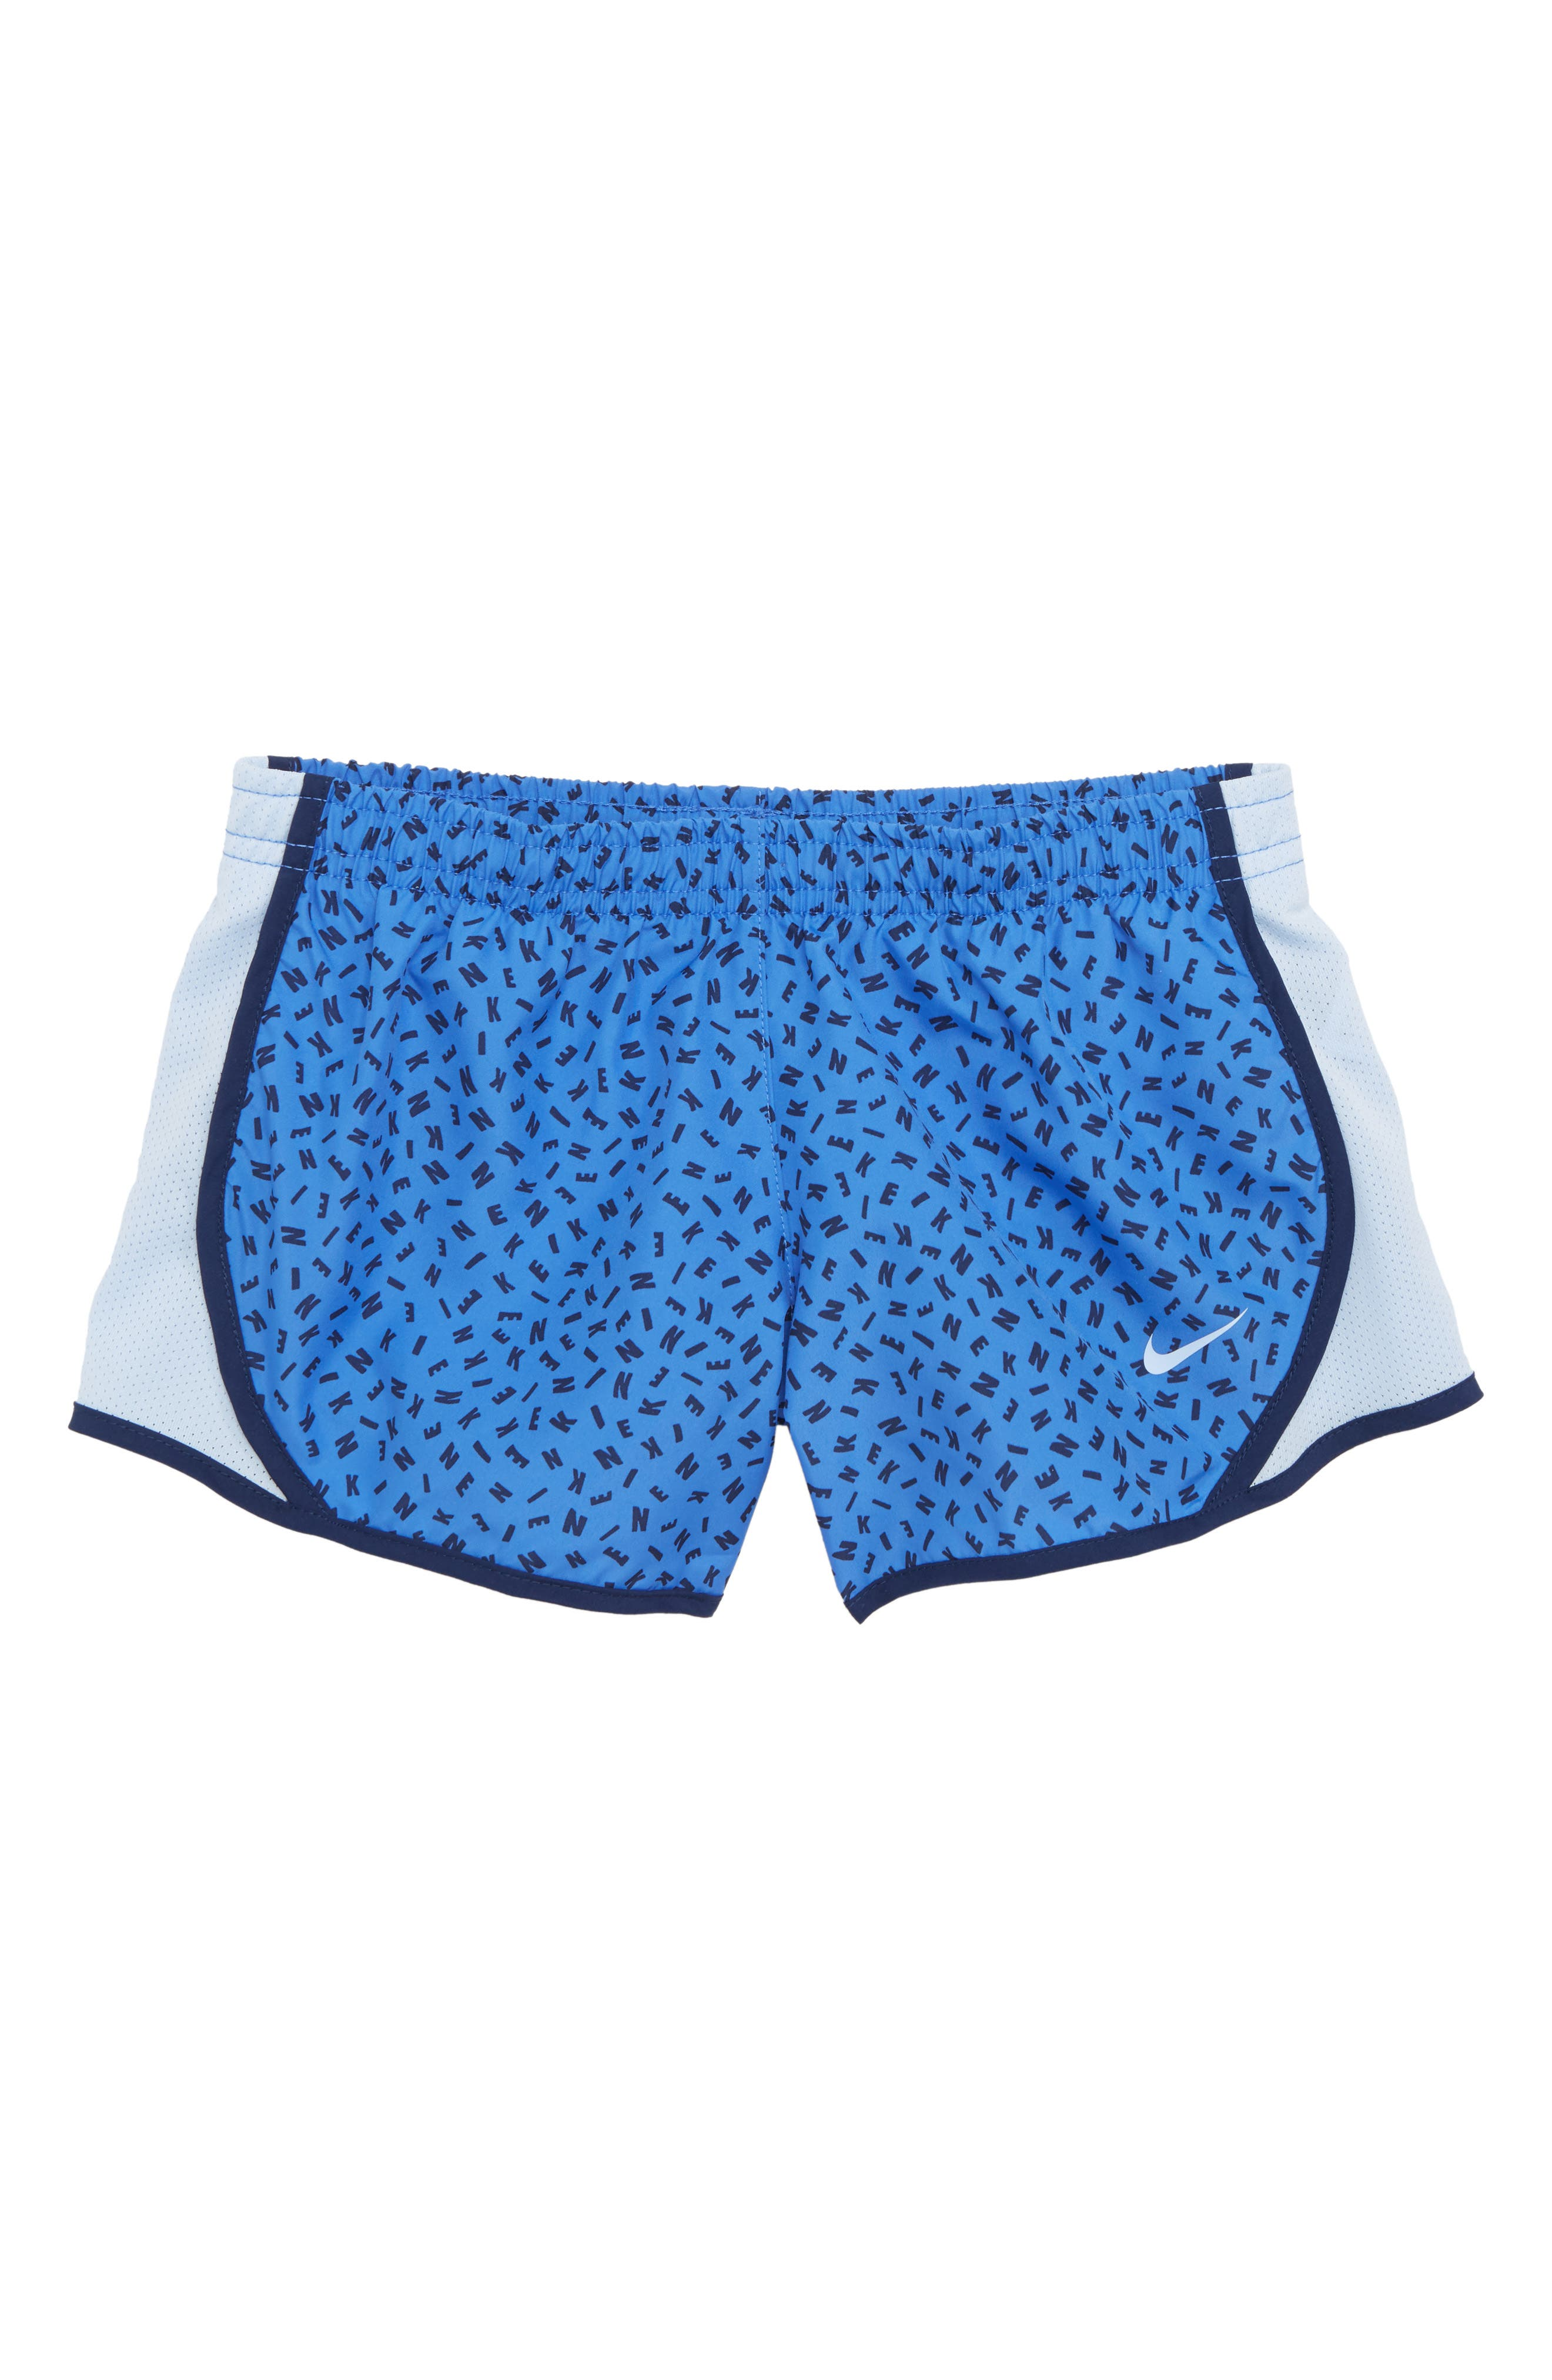 Dry Tempo Shorts,                         Main,                         color, Light Racer Blue/ Royal Tint